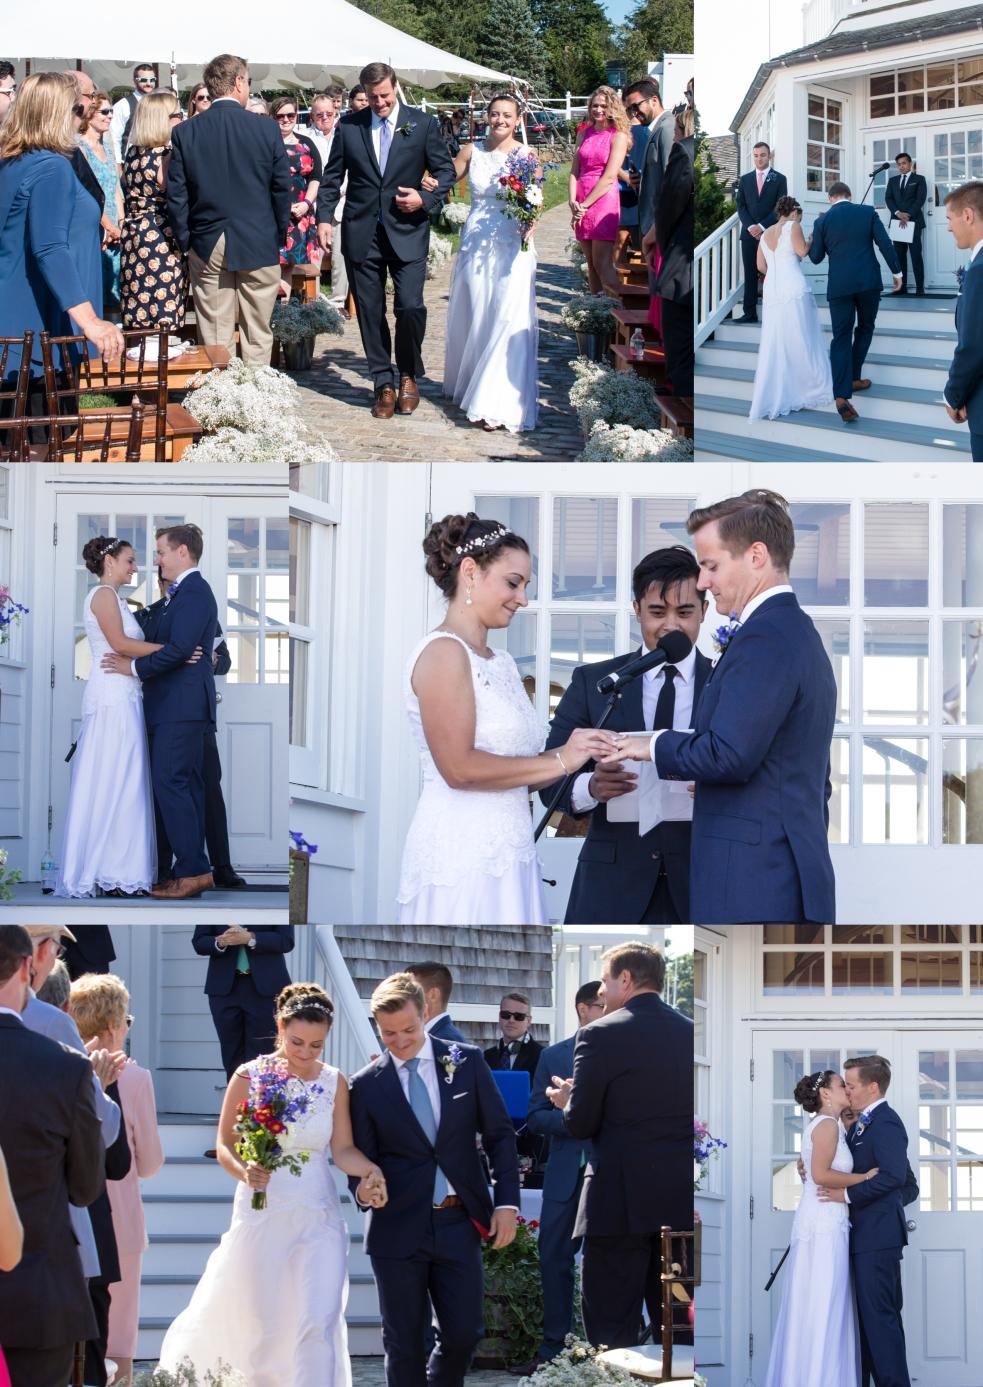 lisa-elizabeth-images-cape-cod-wedding-photographer-8